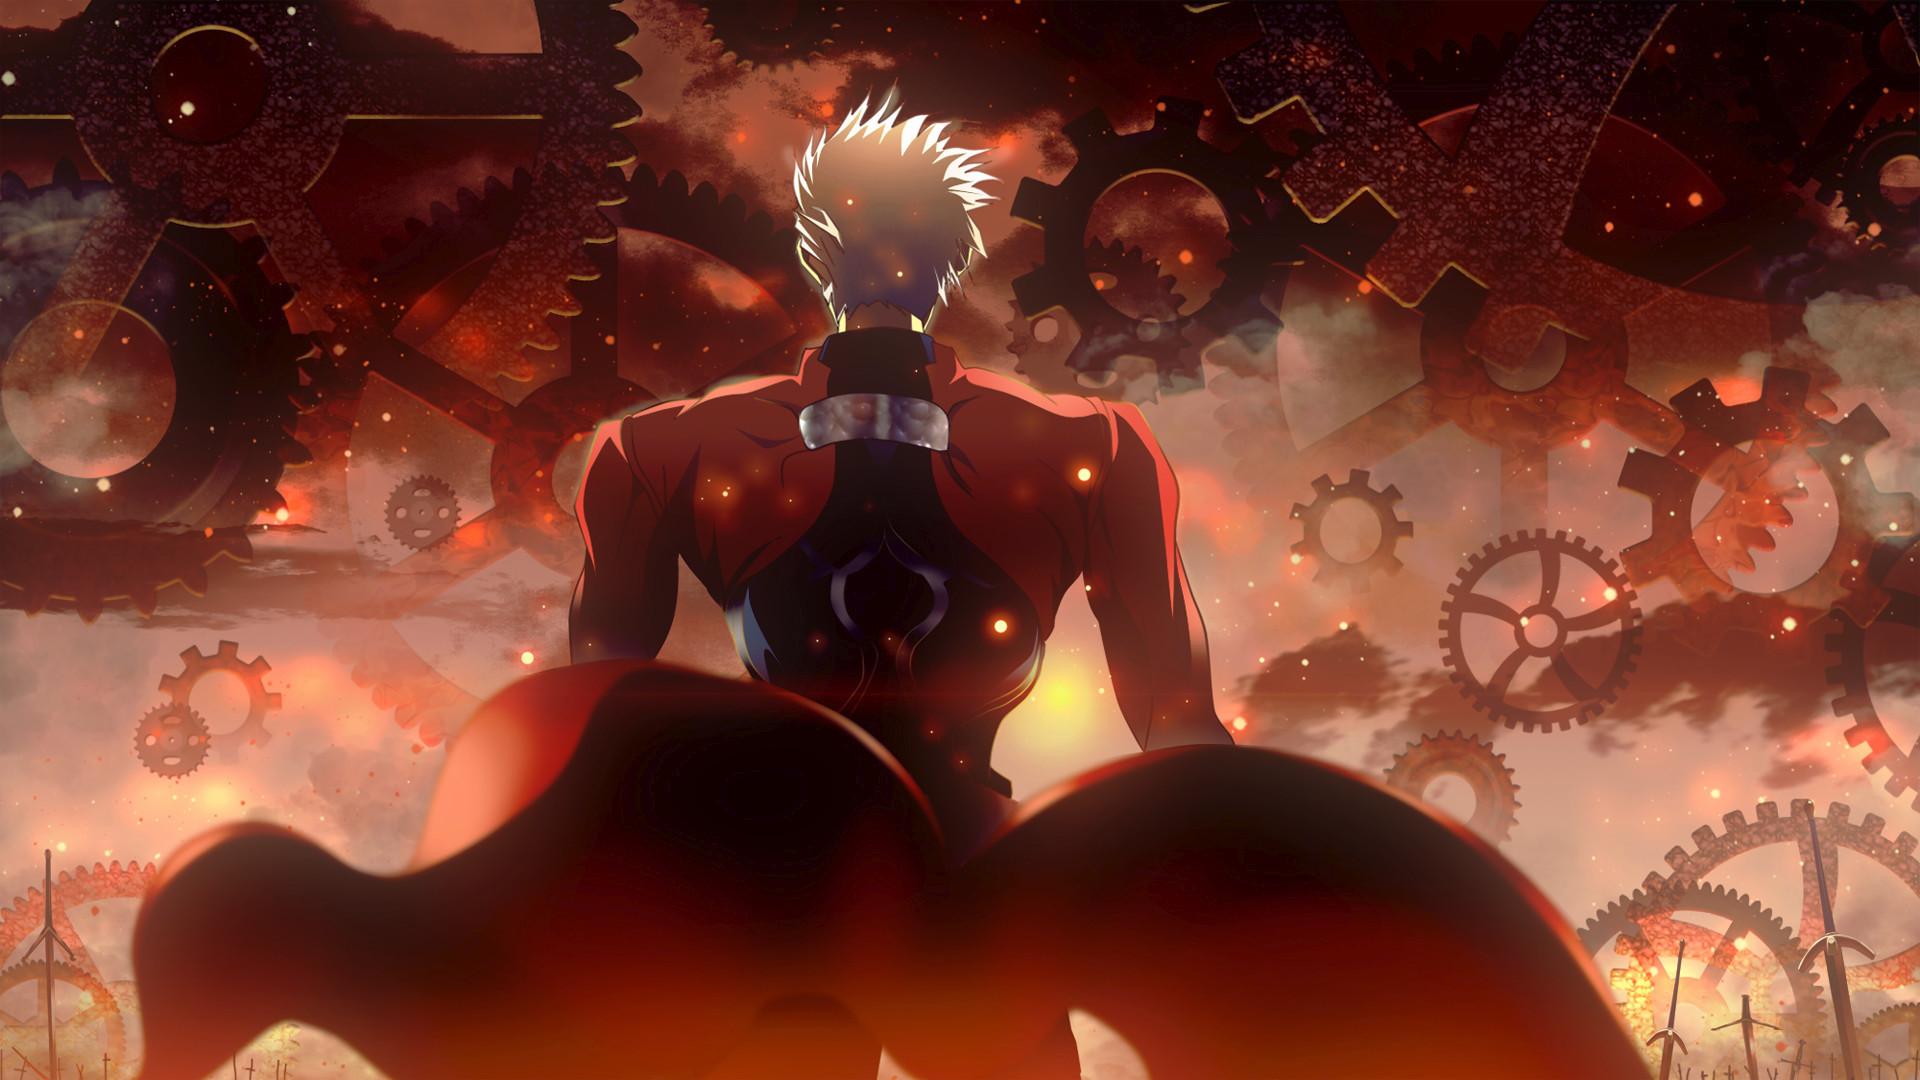 Fate Zero Wallpaper HD (72+ Images